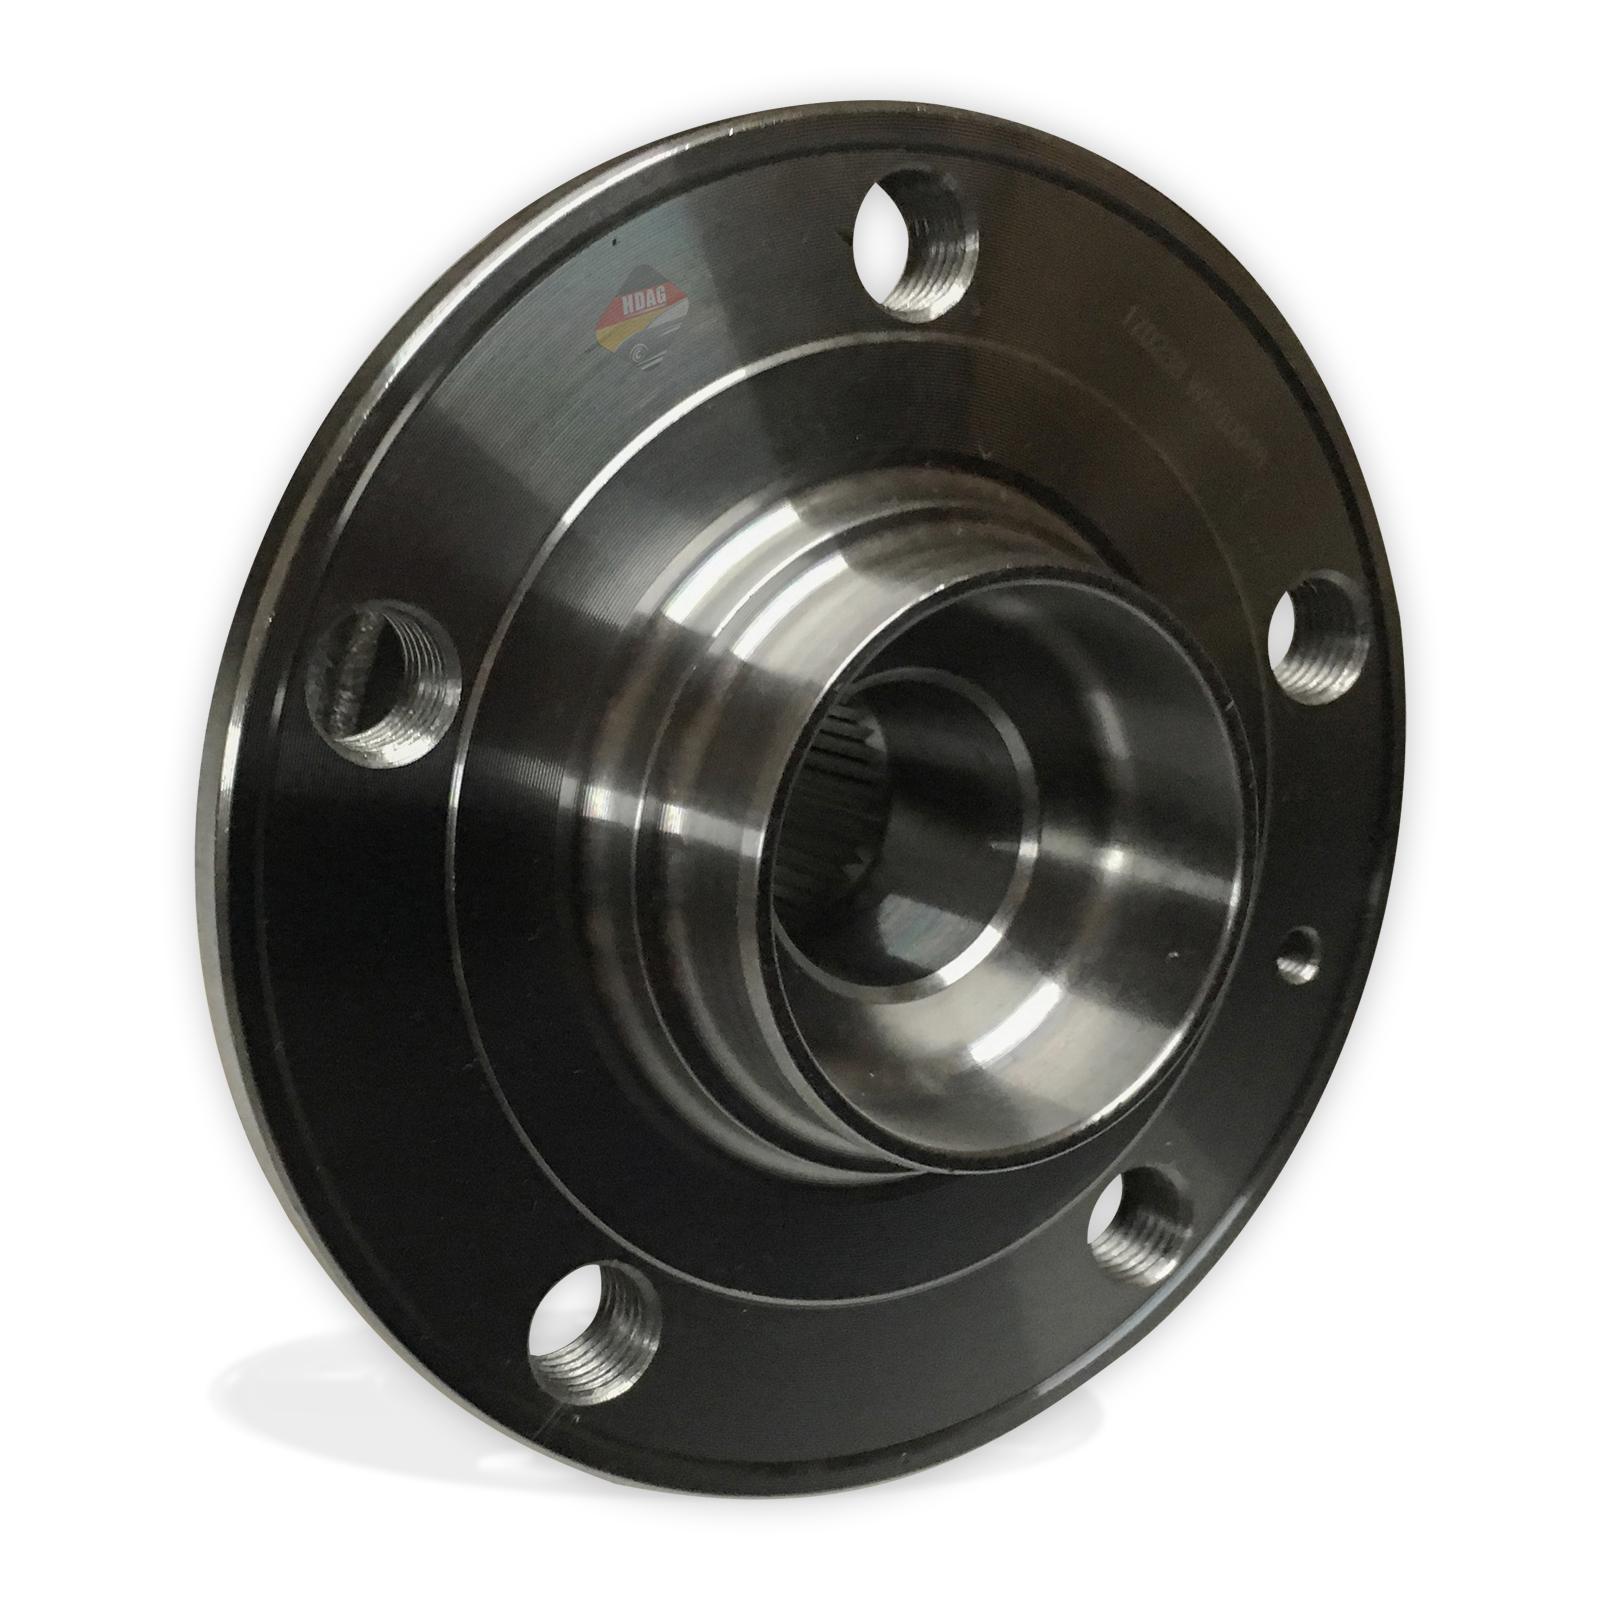 For Audi A3 2.0 TDi 140 8P 2003/>2013 1x Front Hub Wheel Bearing Kit Left Right